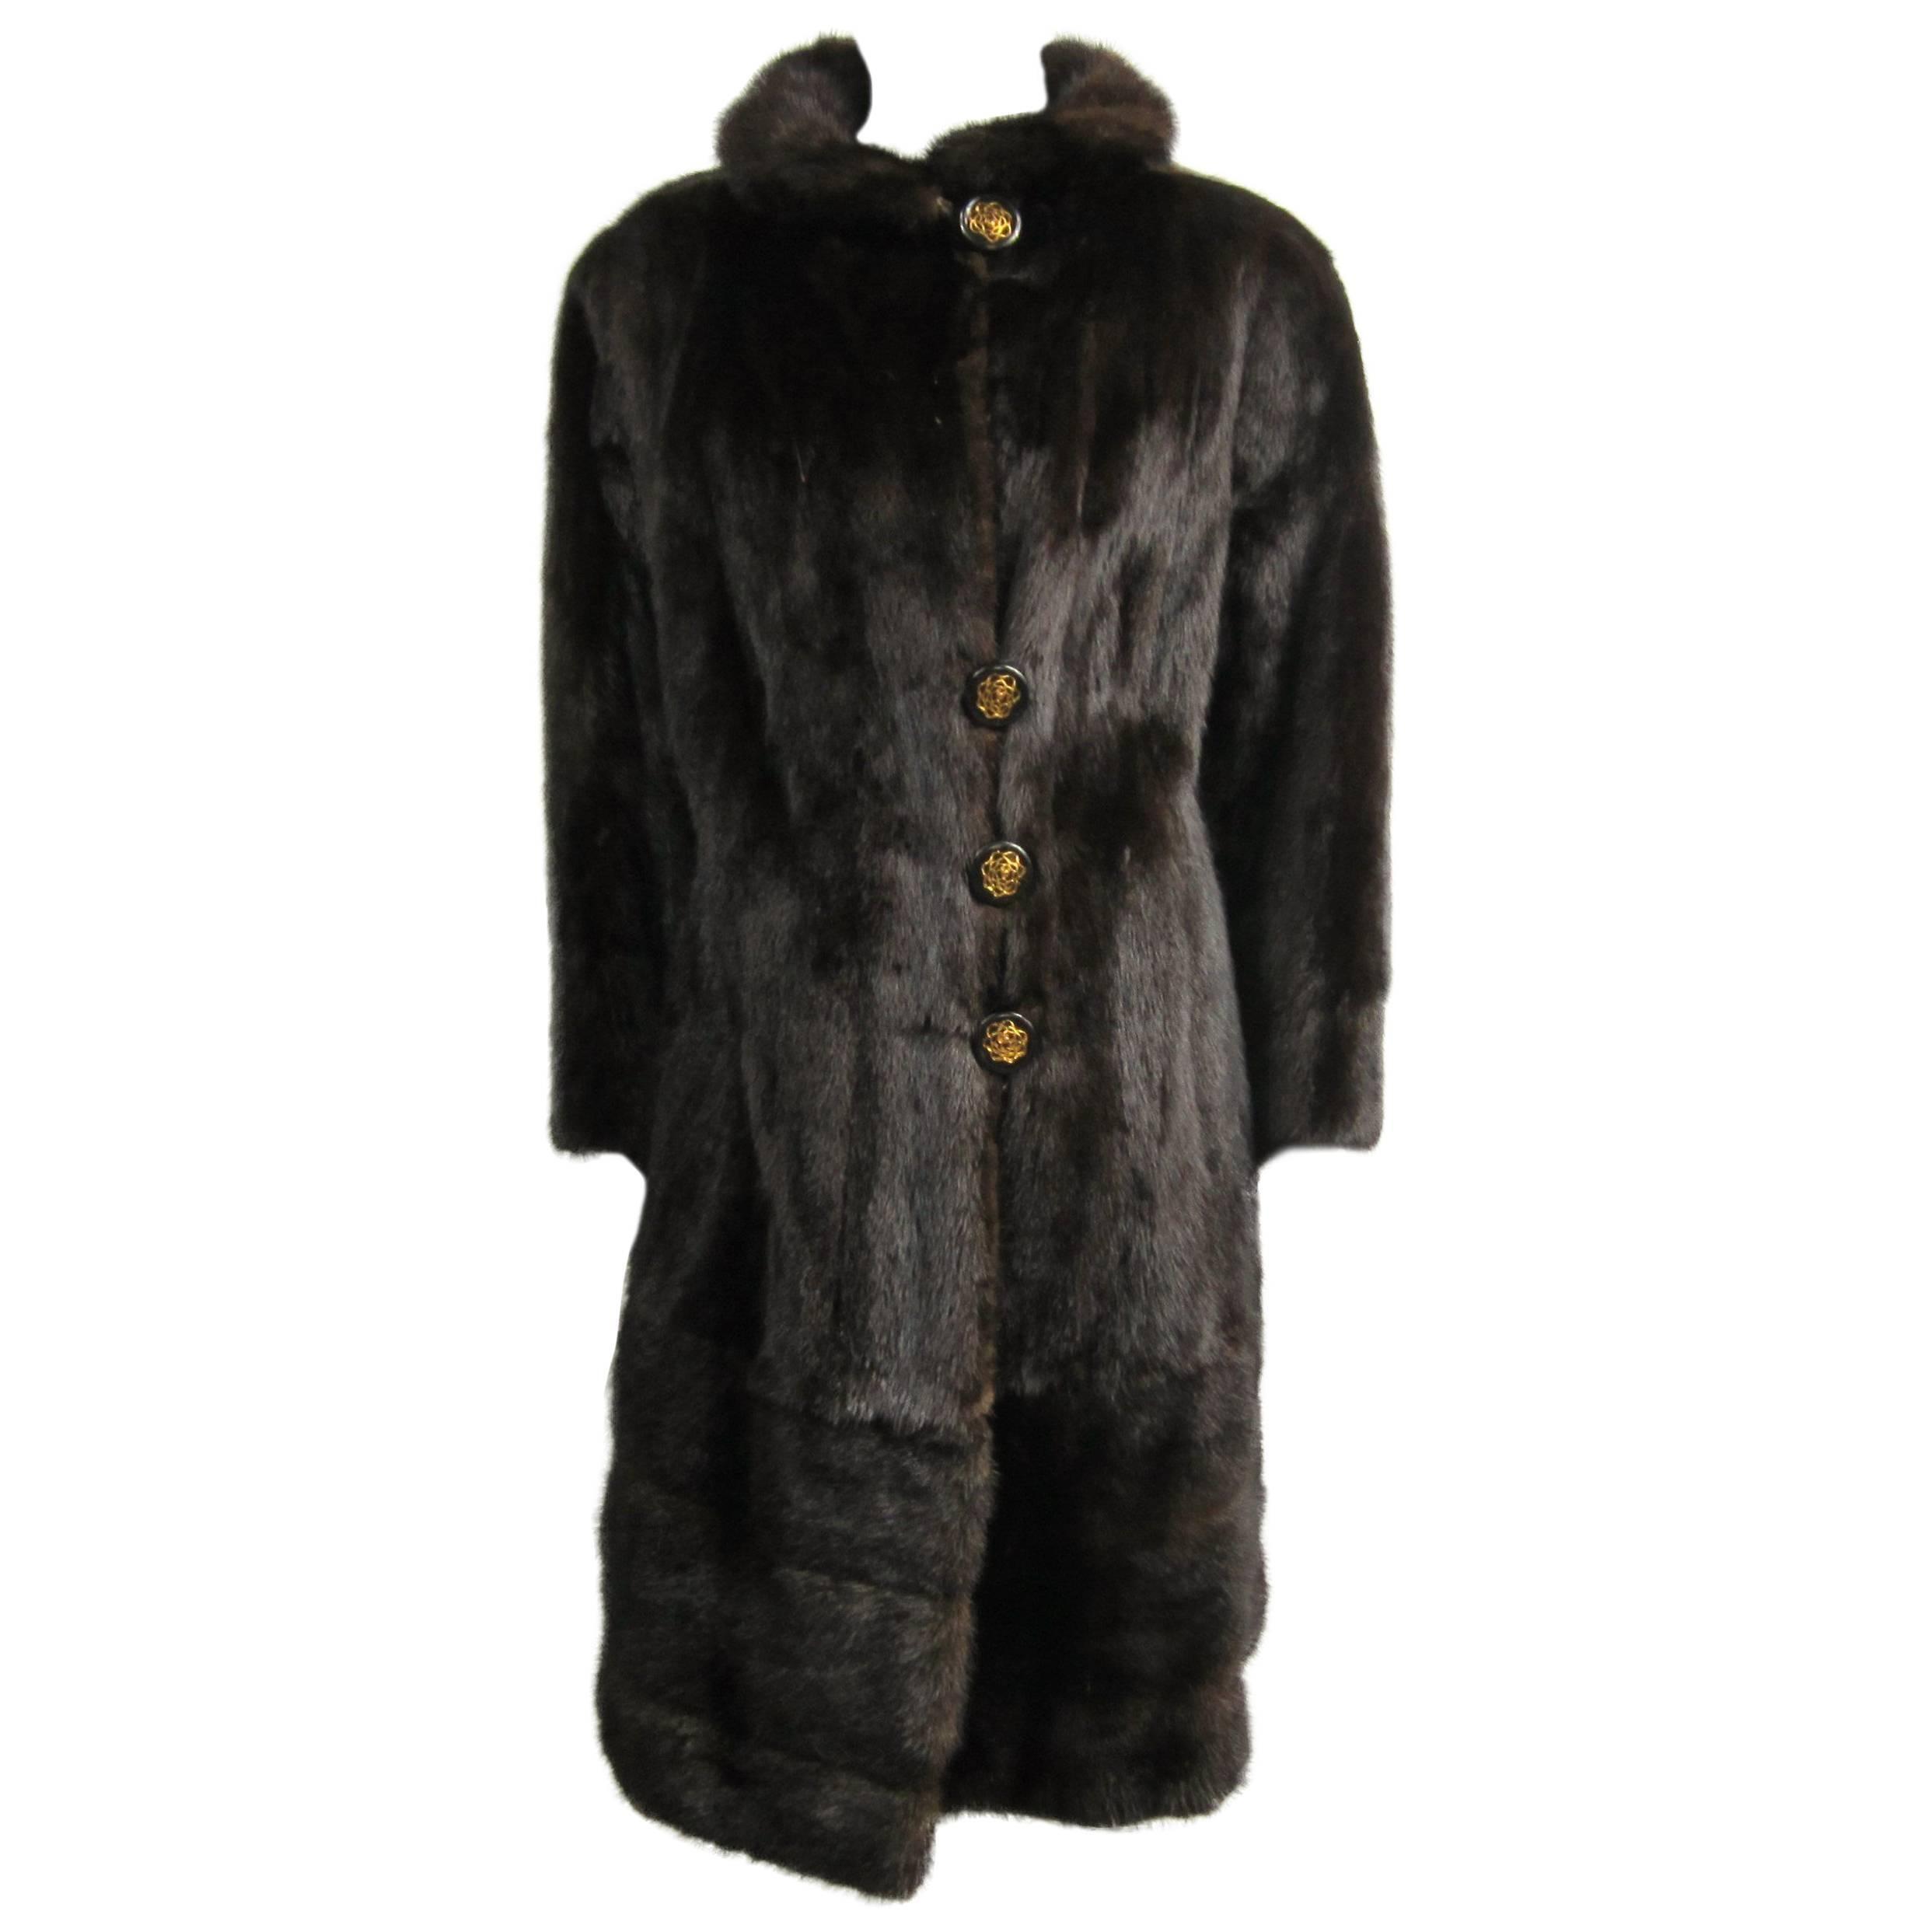 Ranch Mink Fur Coat & Jacket Large w/ Zippered Bottom 2 In 1